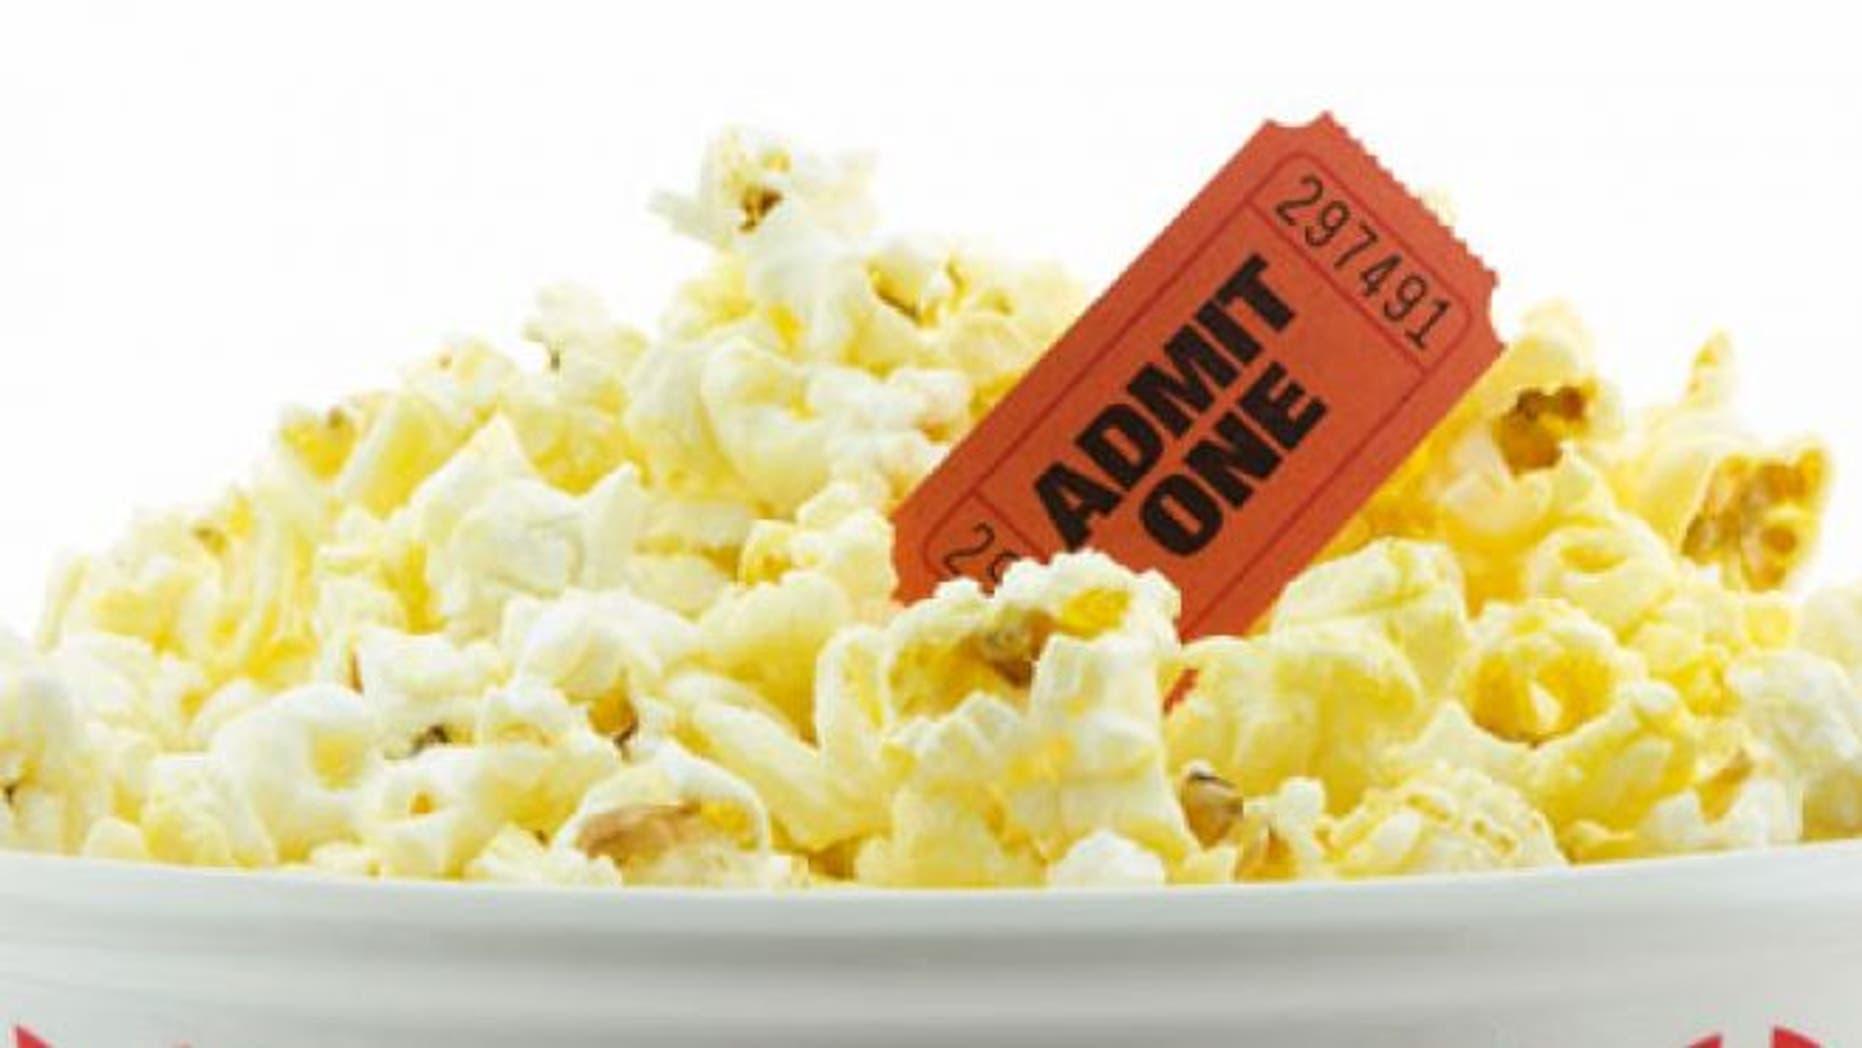 Is popcorn giving you heart disease? | Fox News